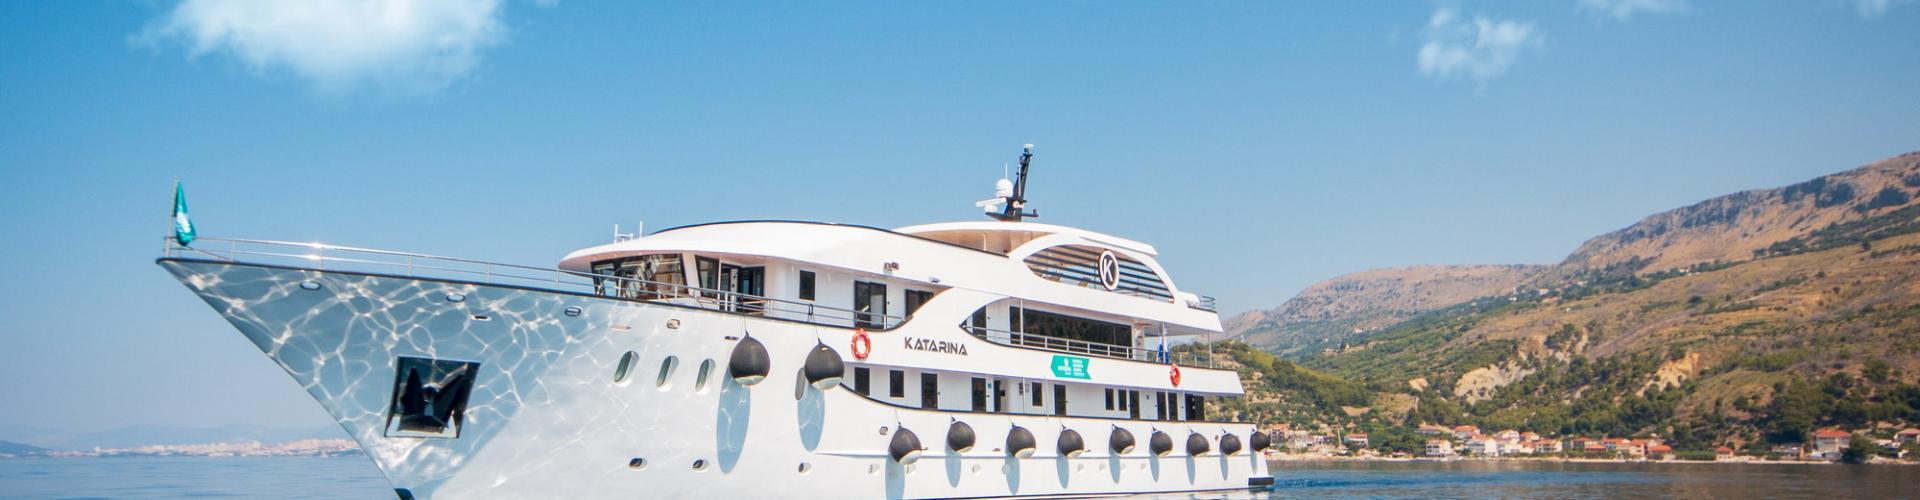 barca a motore Deluxe nave da crociera MV Katarina